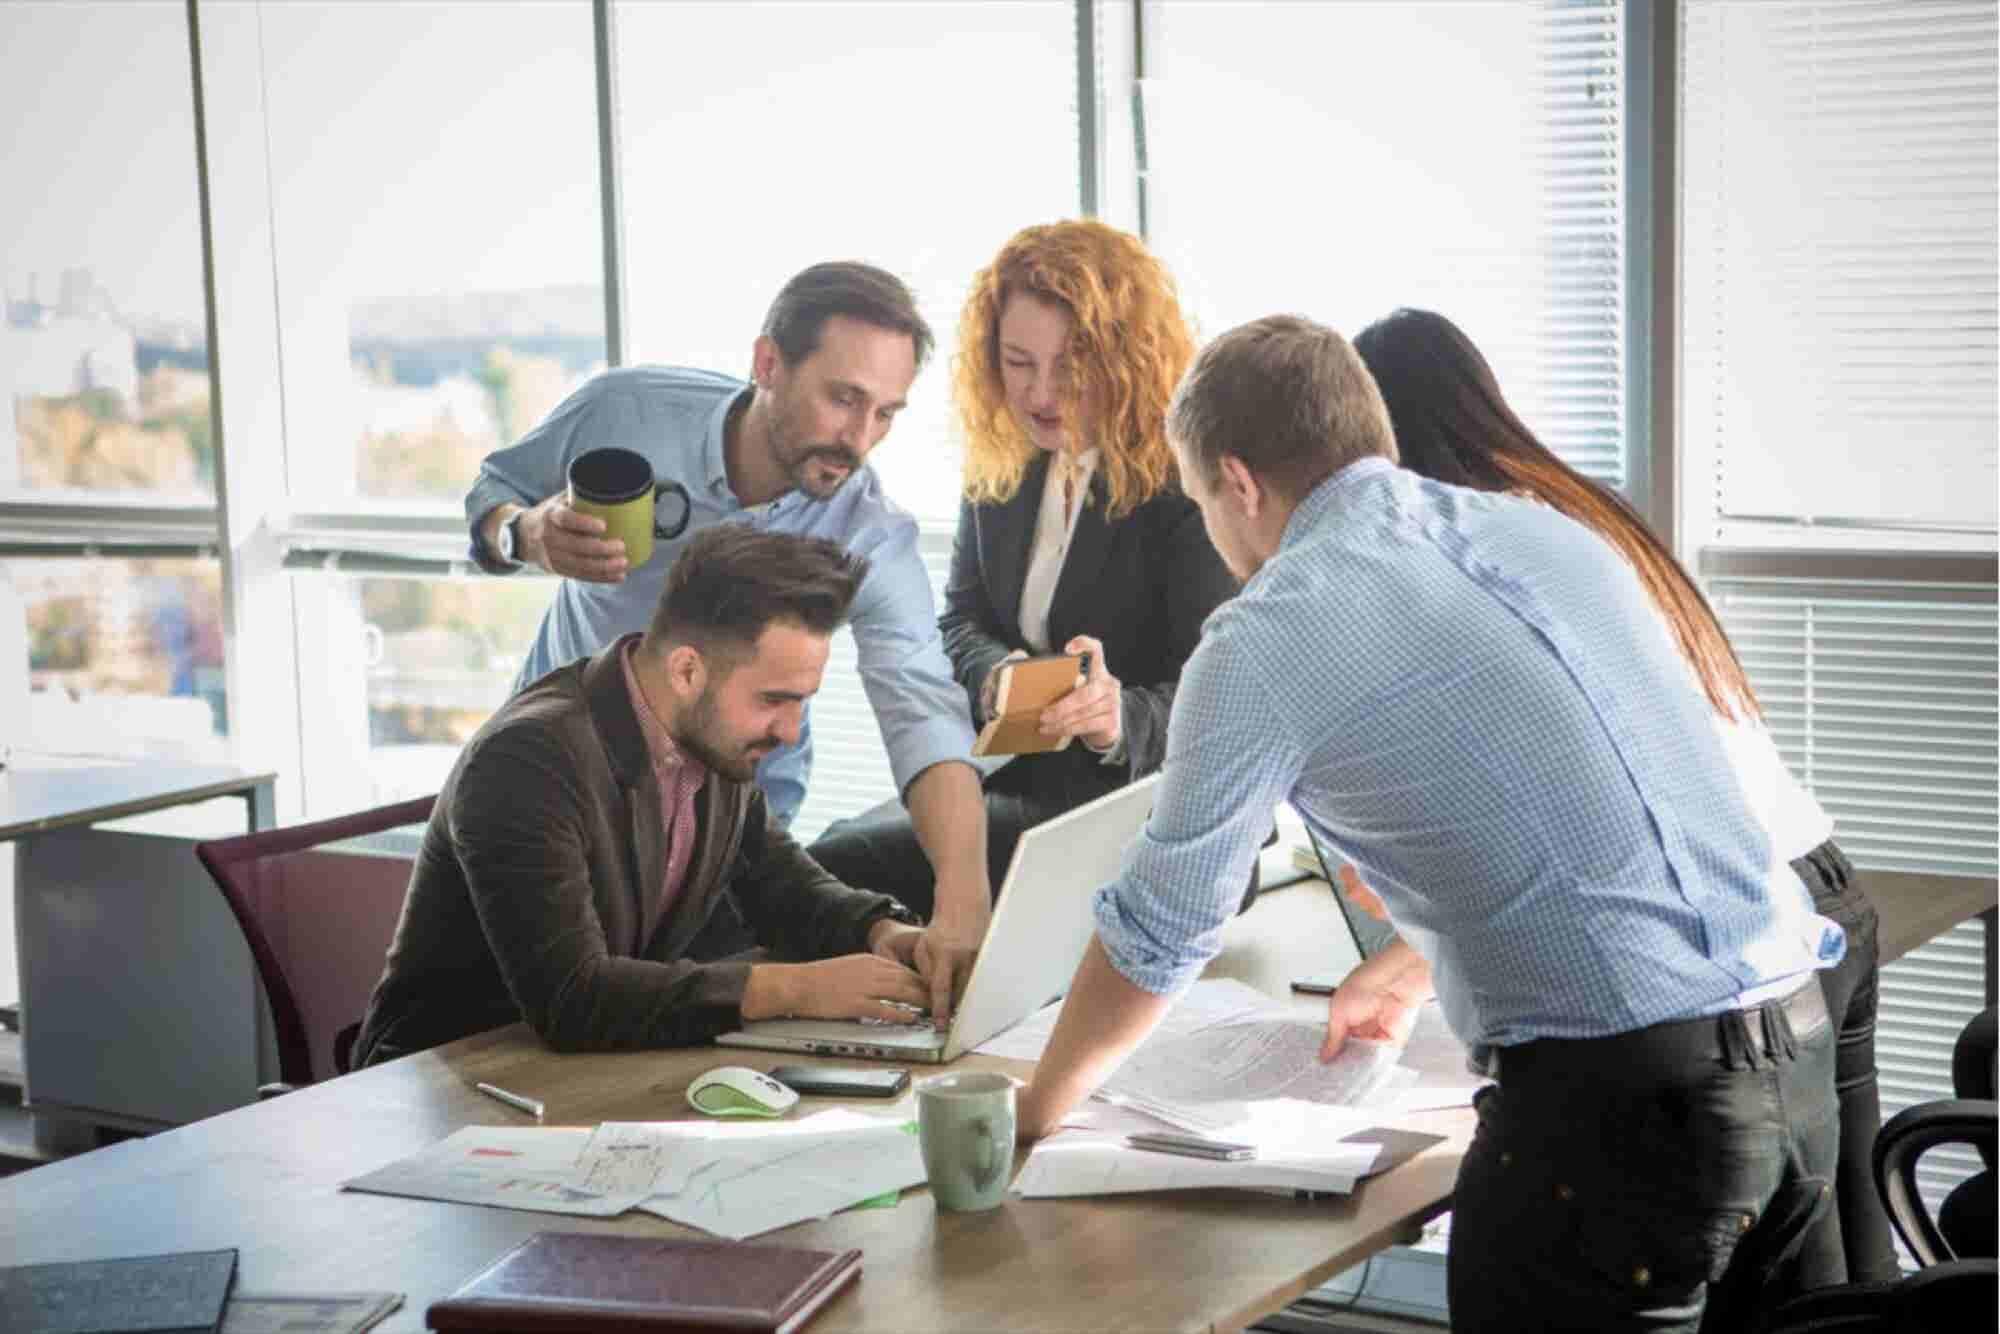 Three Little Factors That Wreak Havoc On Workplace Productivity